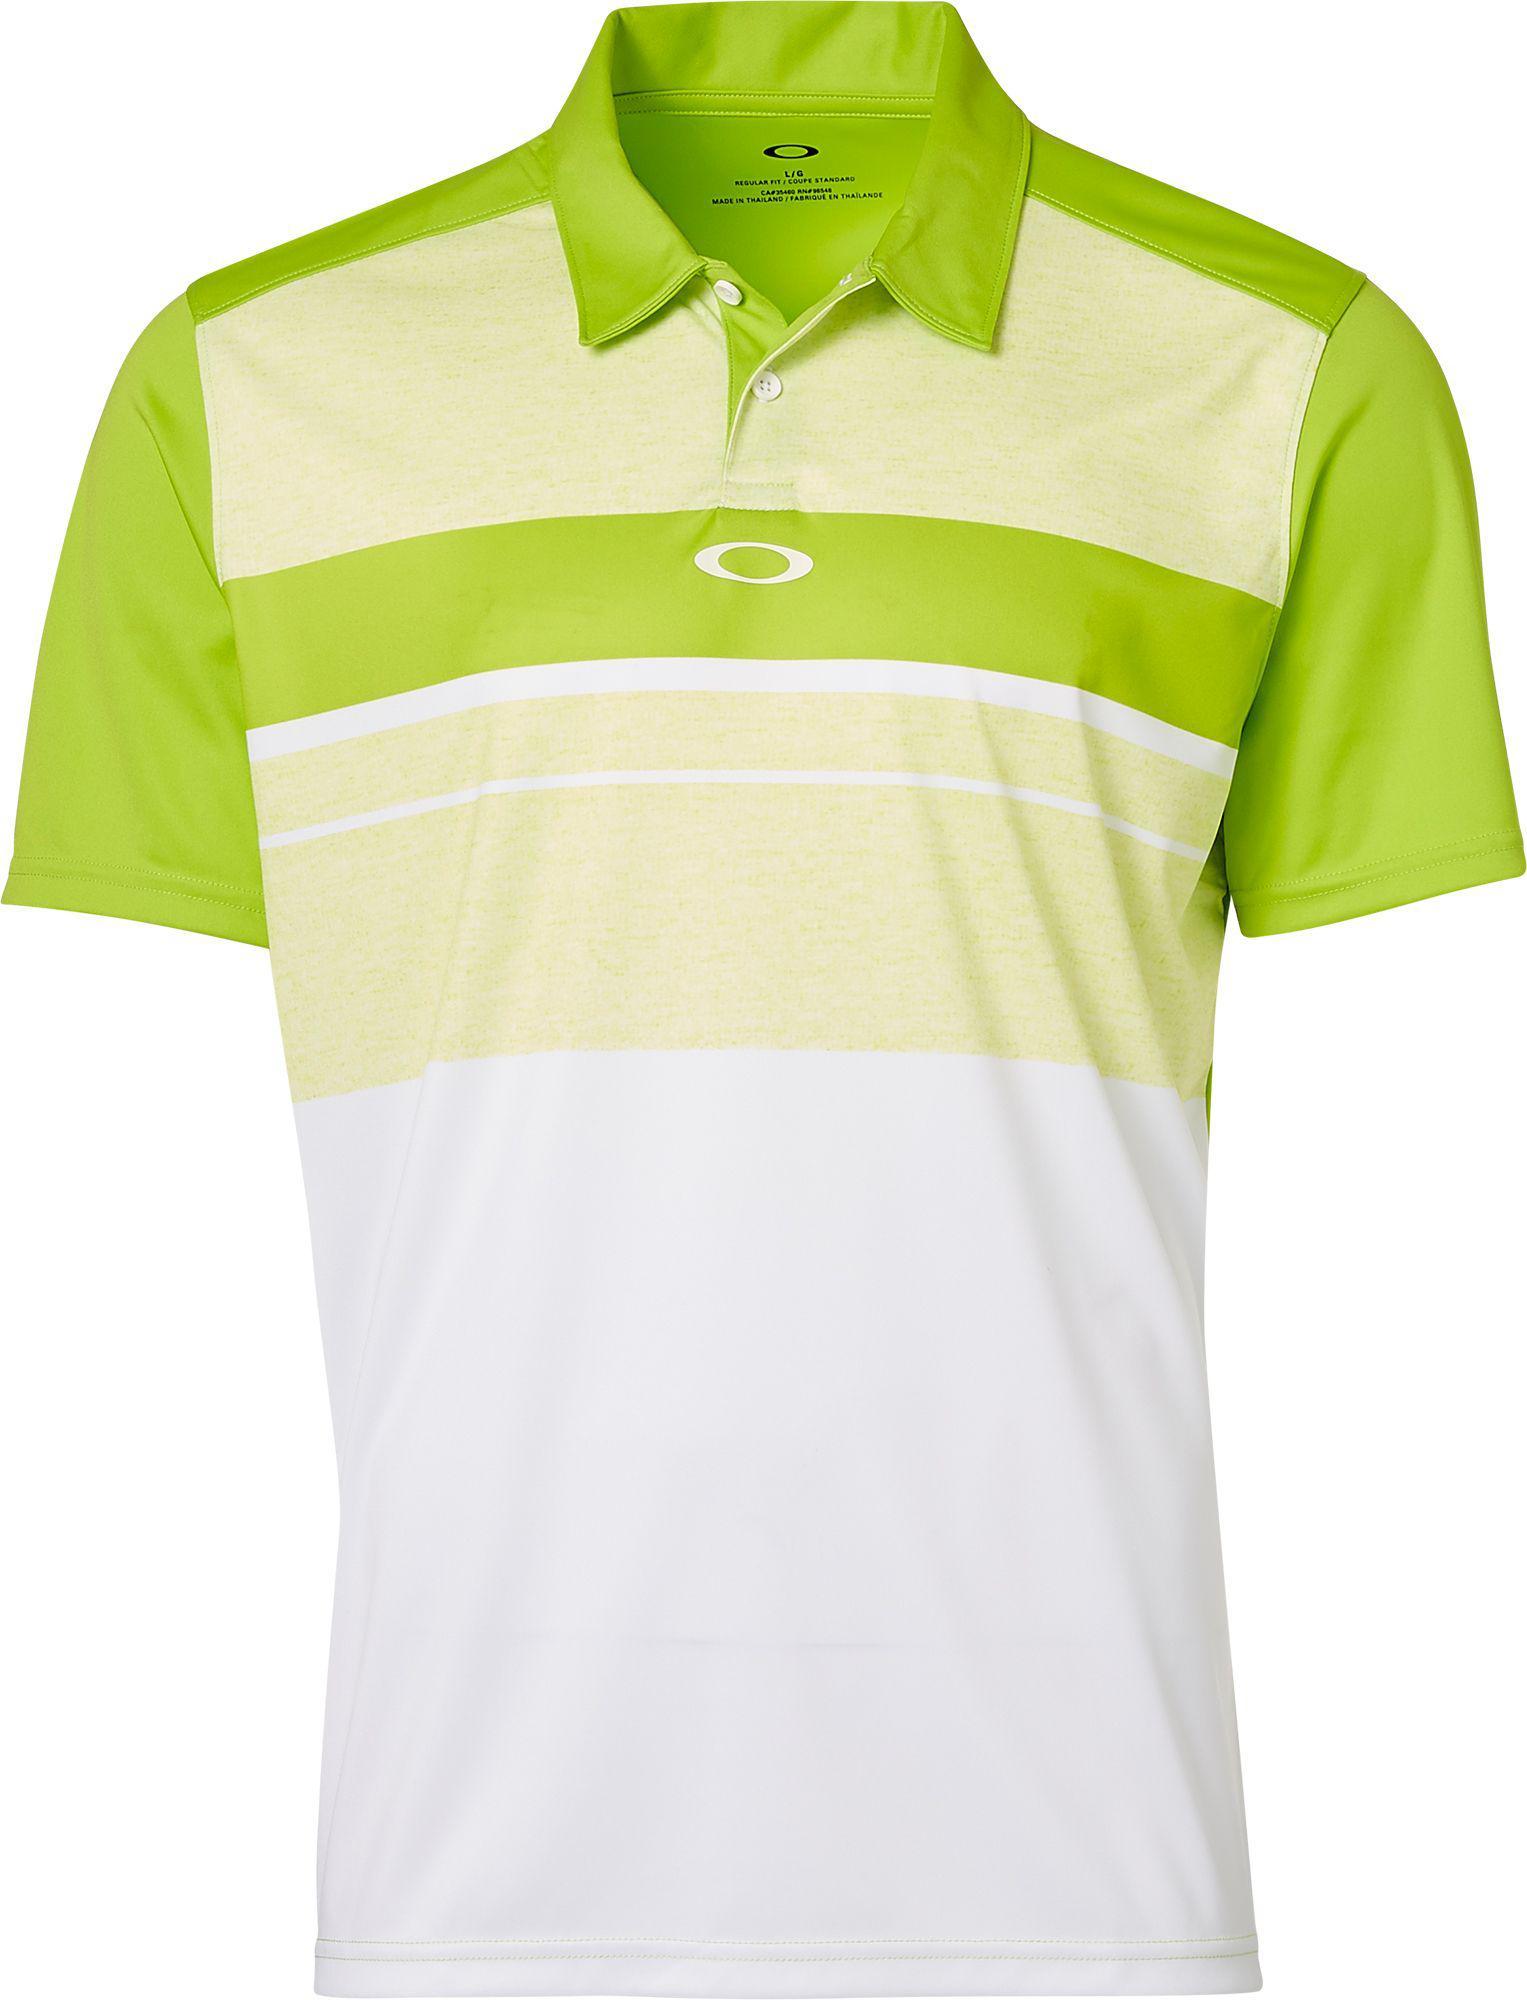 601e3f2706f1 Oakley Major Golf Polo in Green for Men - Lyst